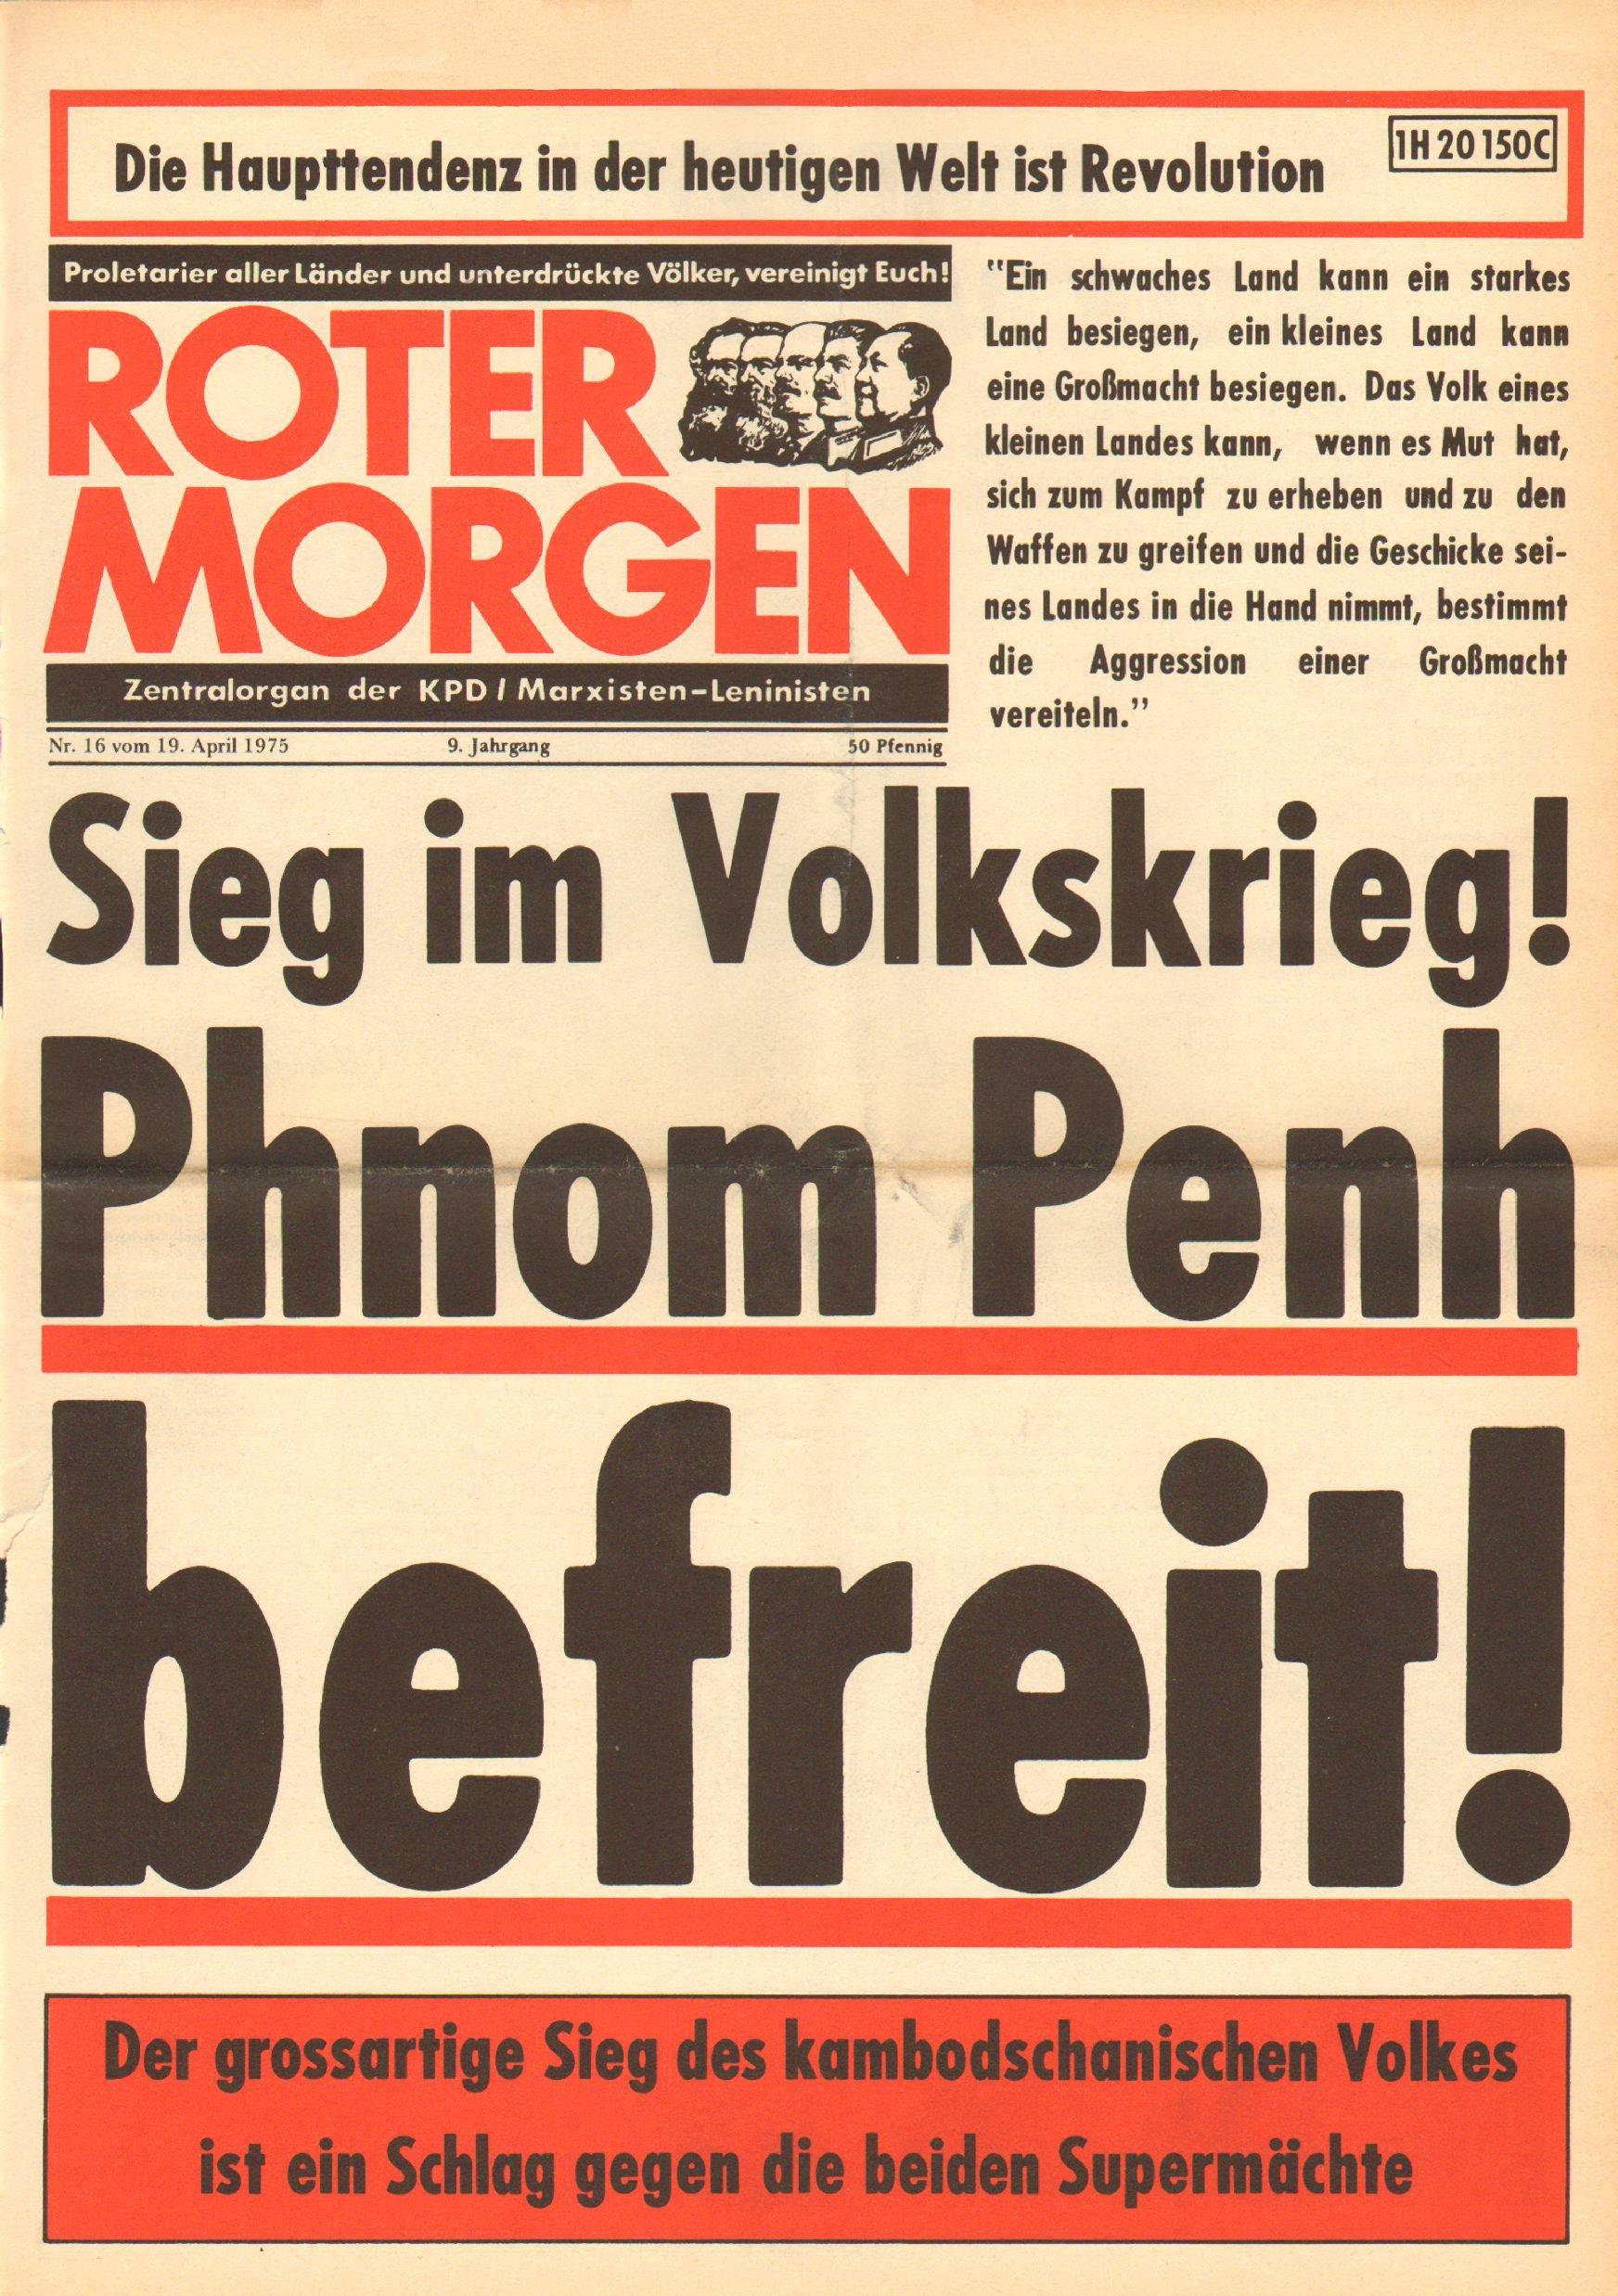 Roter Morgen, 9. Jg., 19. April 1975, Nr. 16, Seite 1